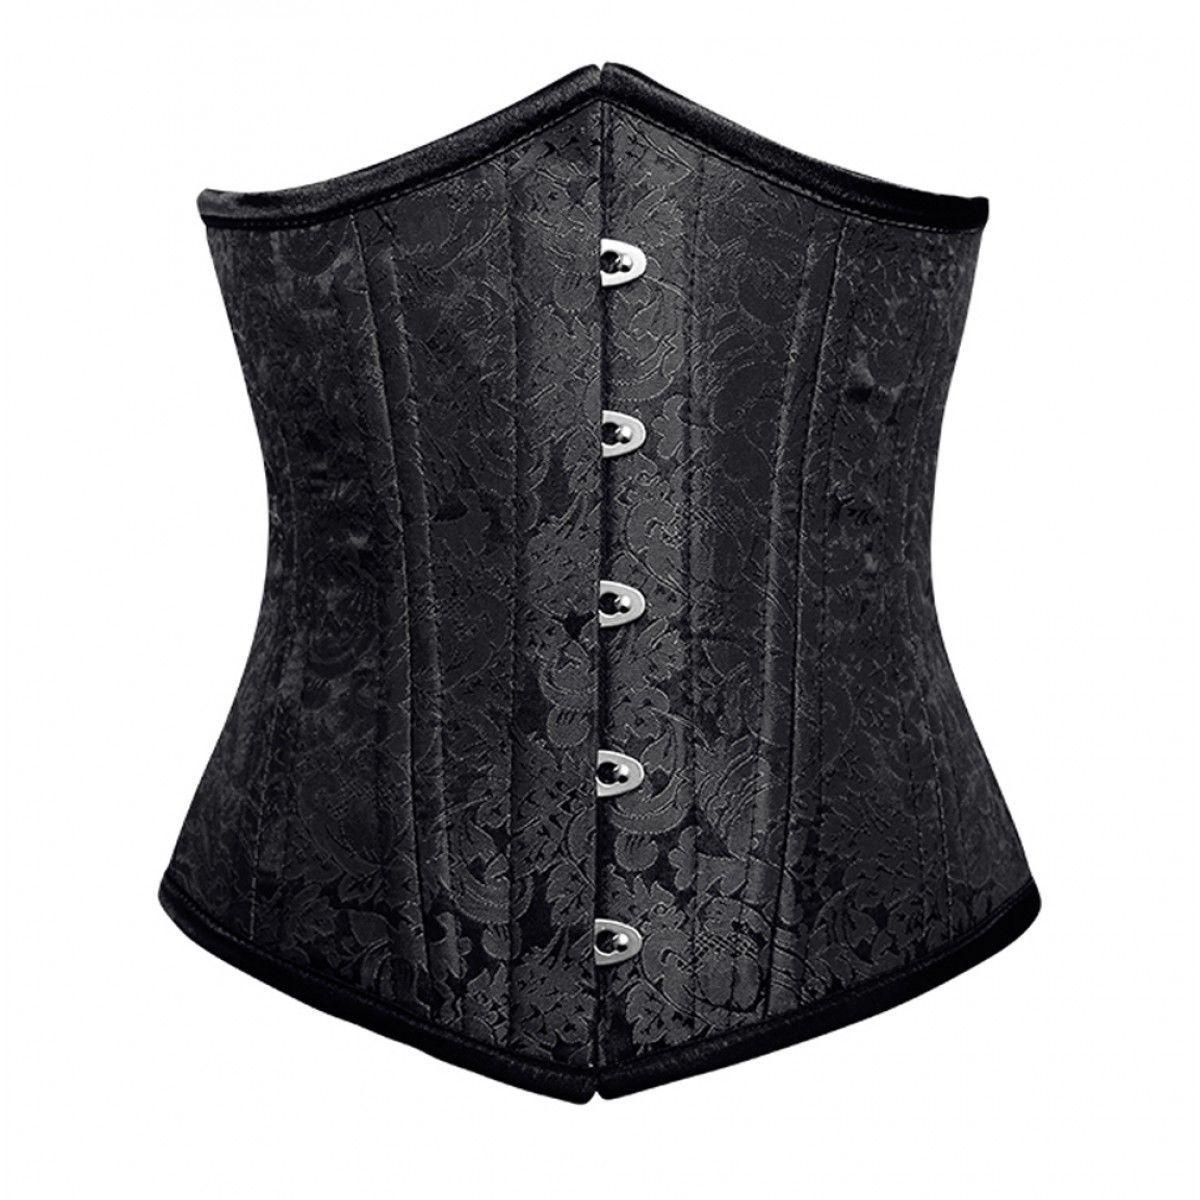 Black Brocade Double Bone Bustier Gothic Basque Underbust Corset Costume